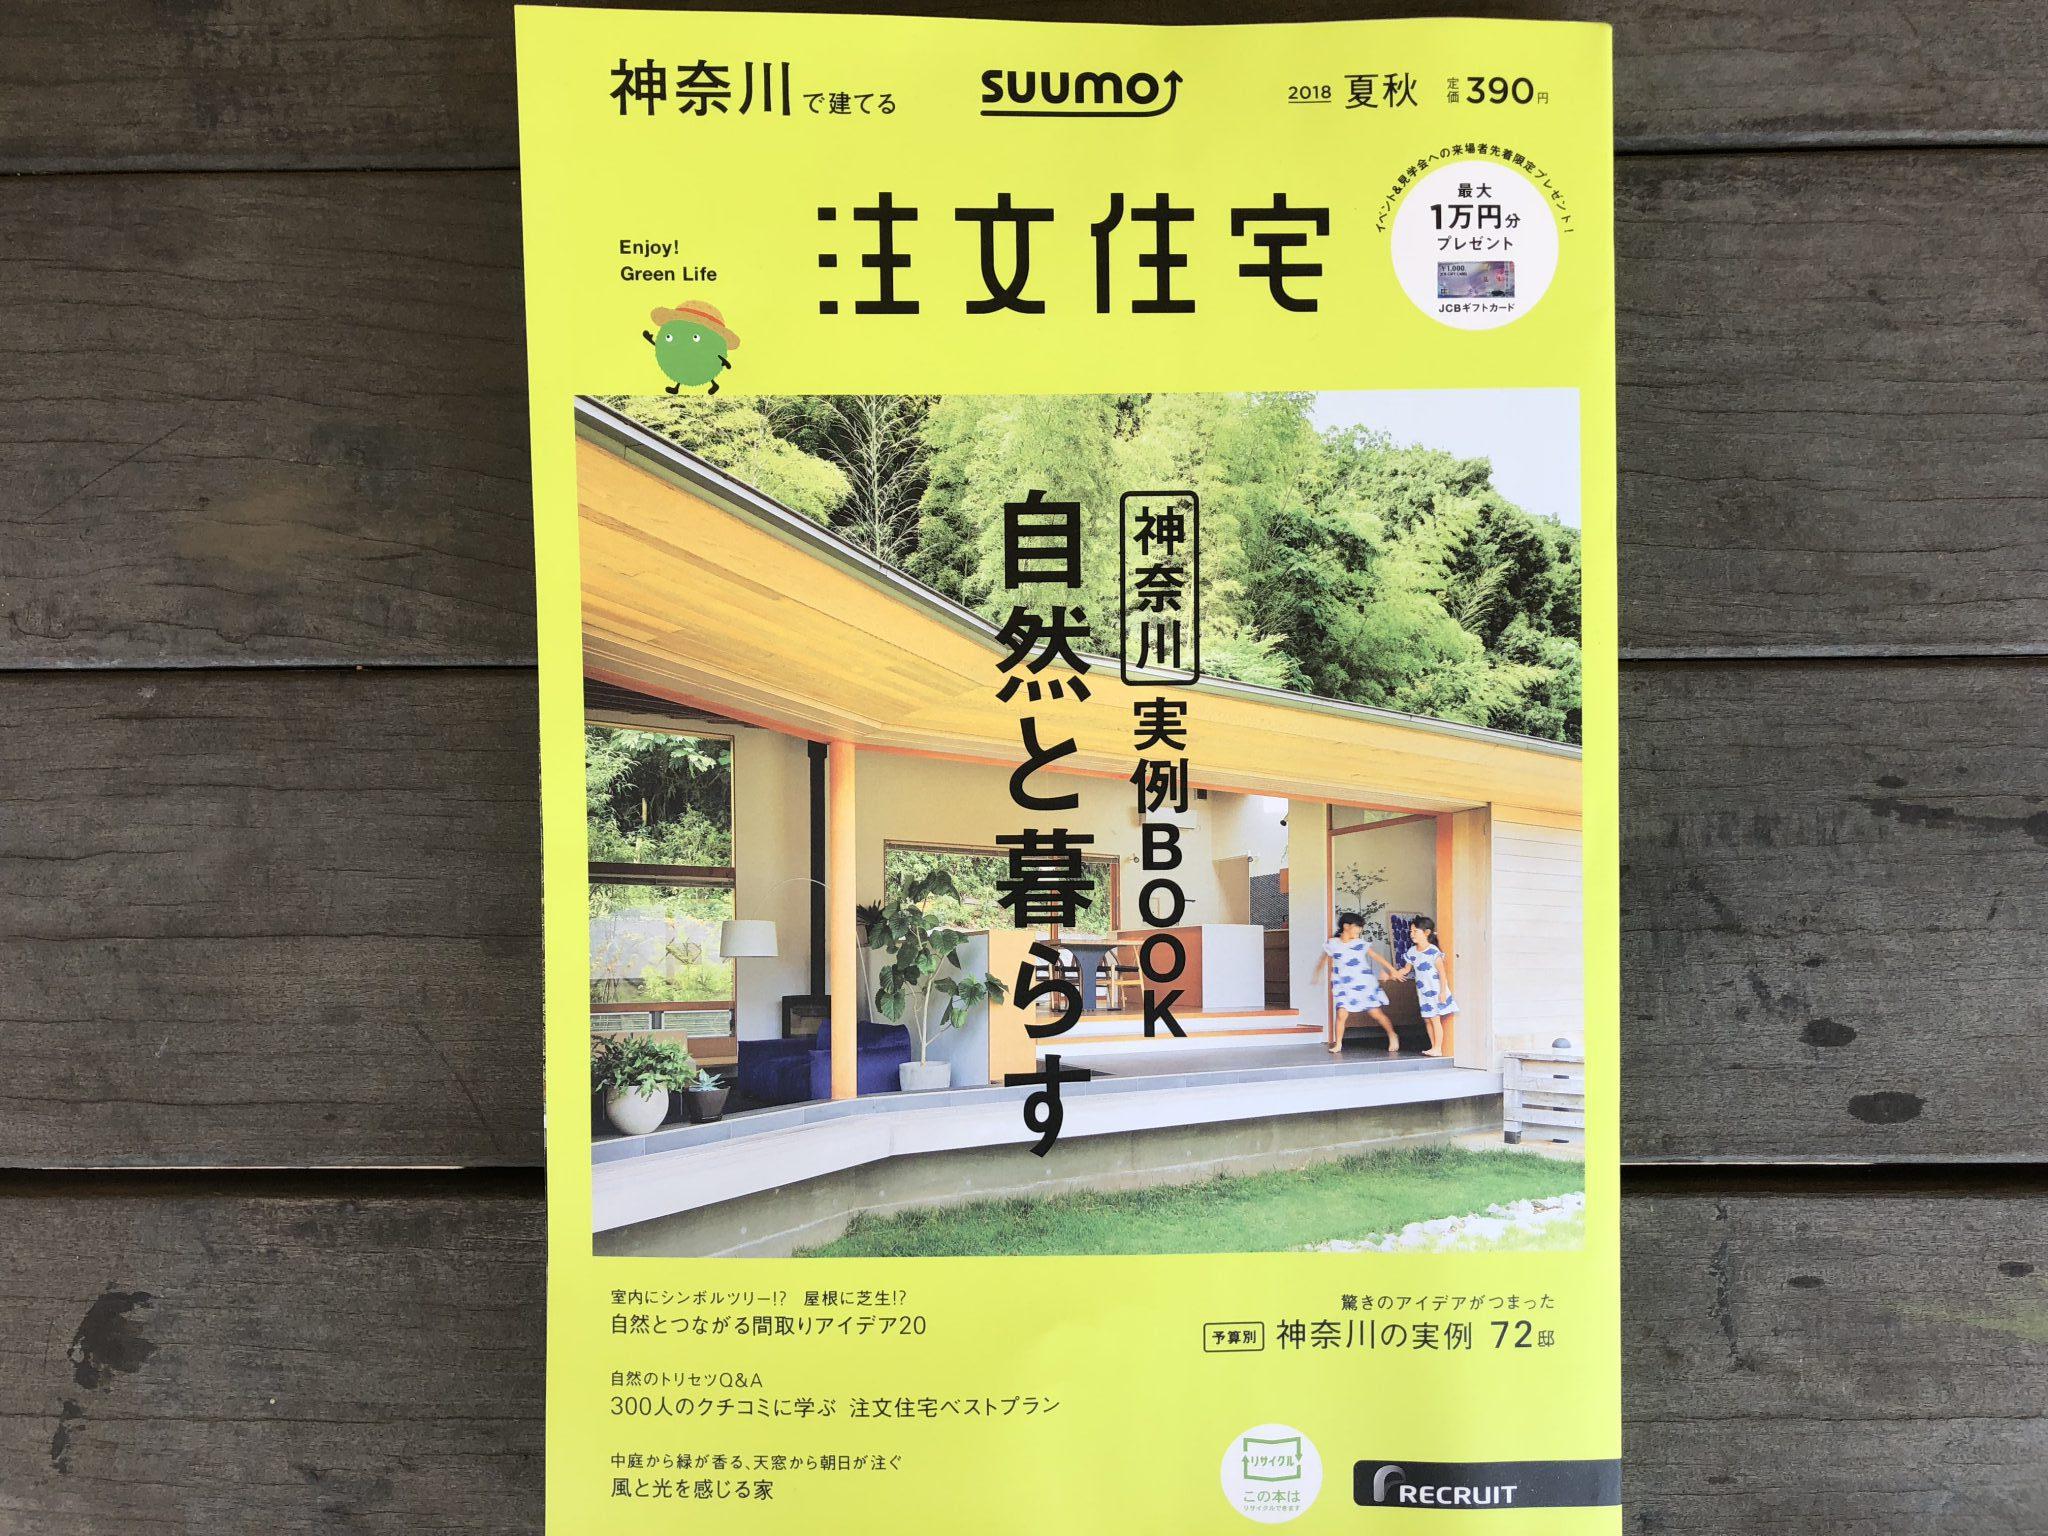 SUUMO注文住宅 夏秋号 『自然と暮らす』特集プレゼント